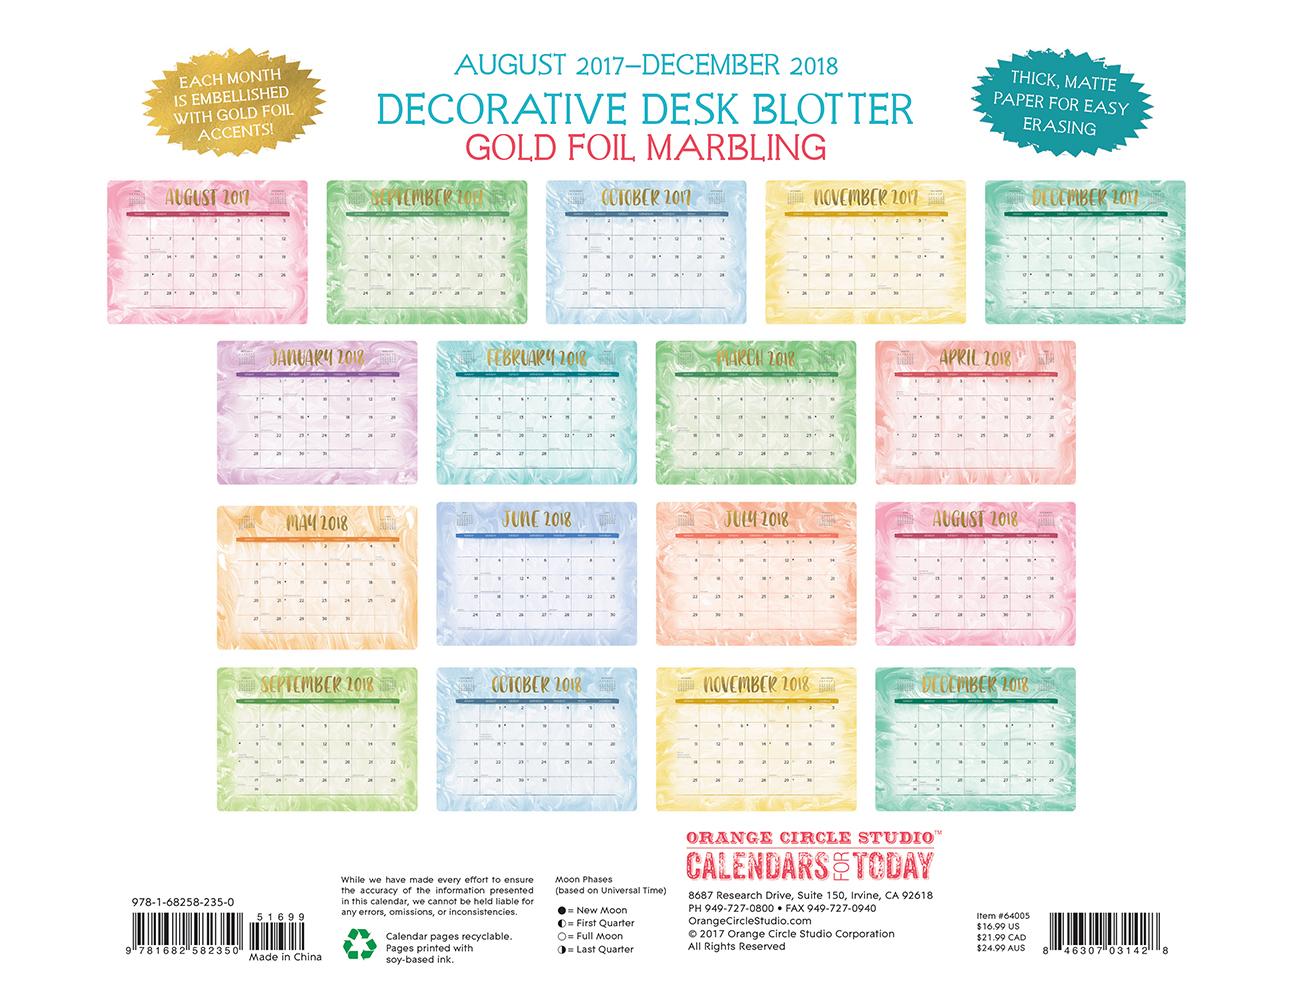 Gold Foil Marbling Decorative Desk Calendars 2018 by Orange Circle Studio back 9781682582350